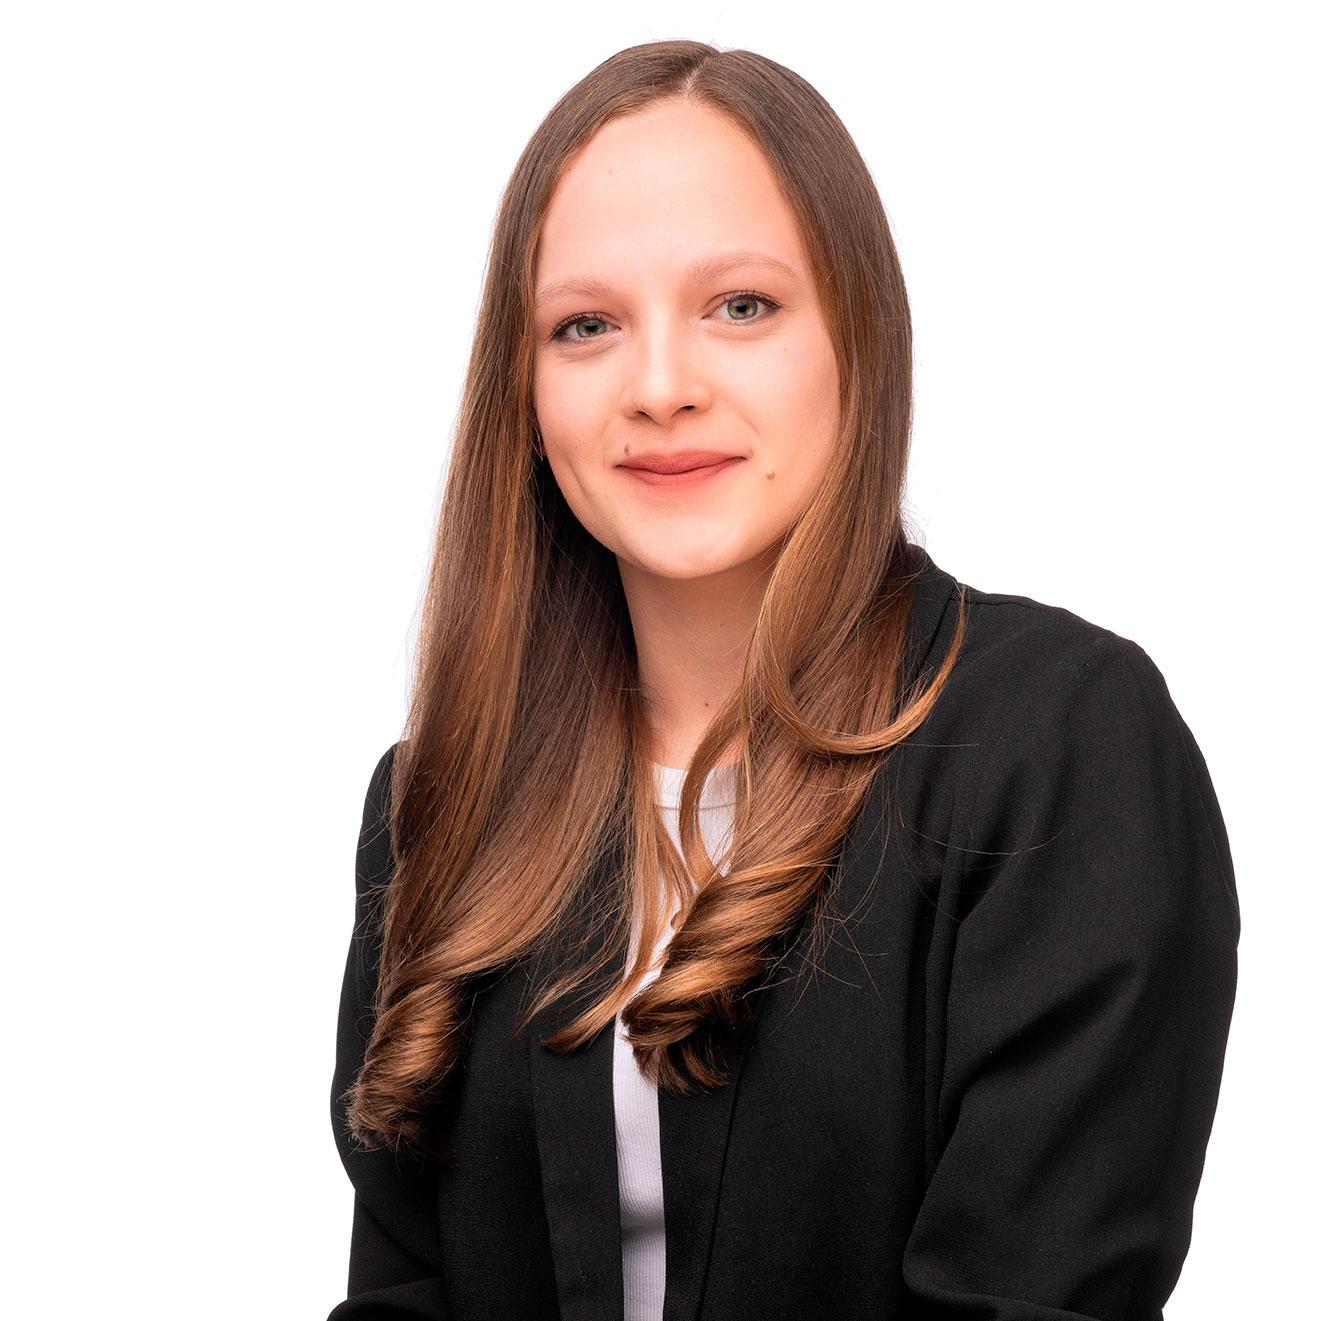 Eva Neuenschwander